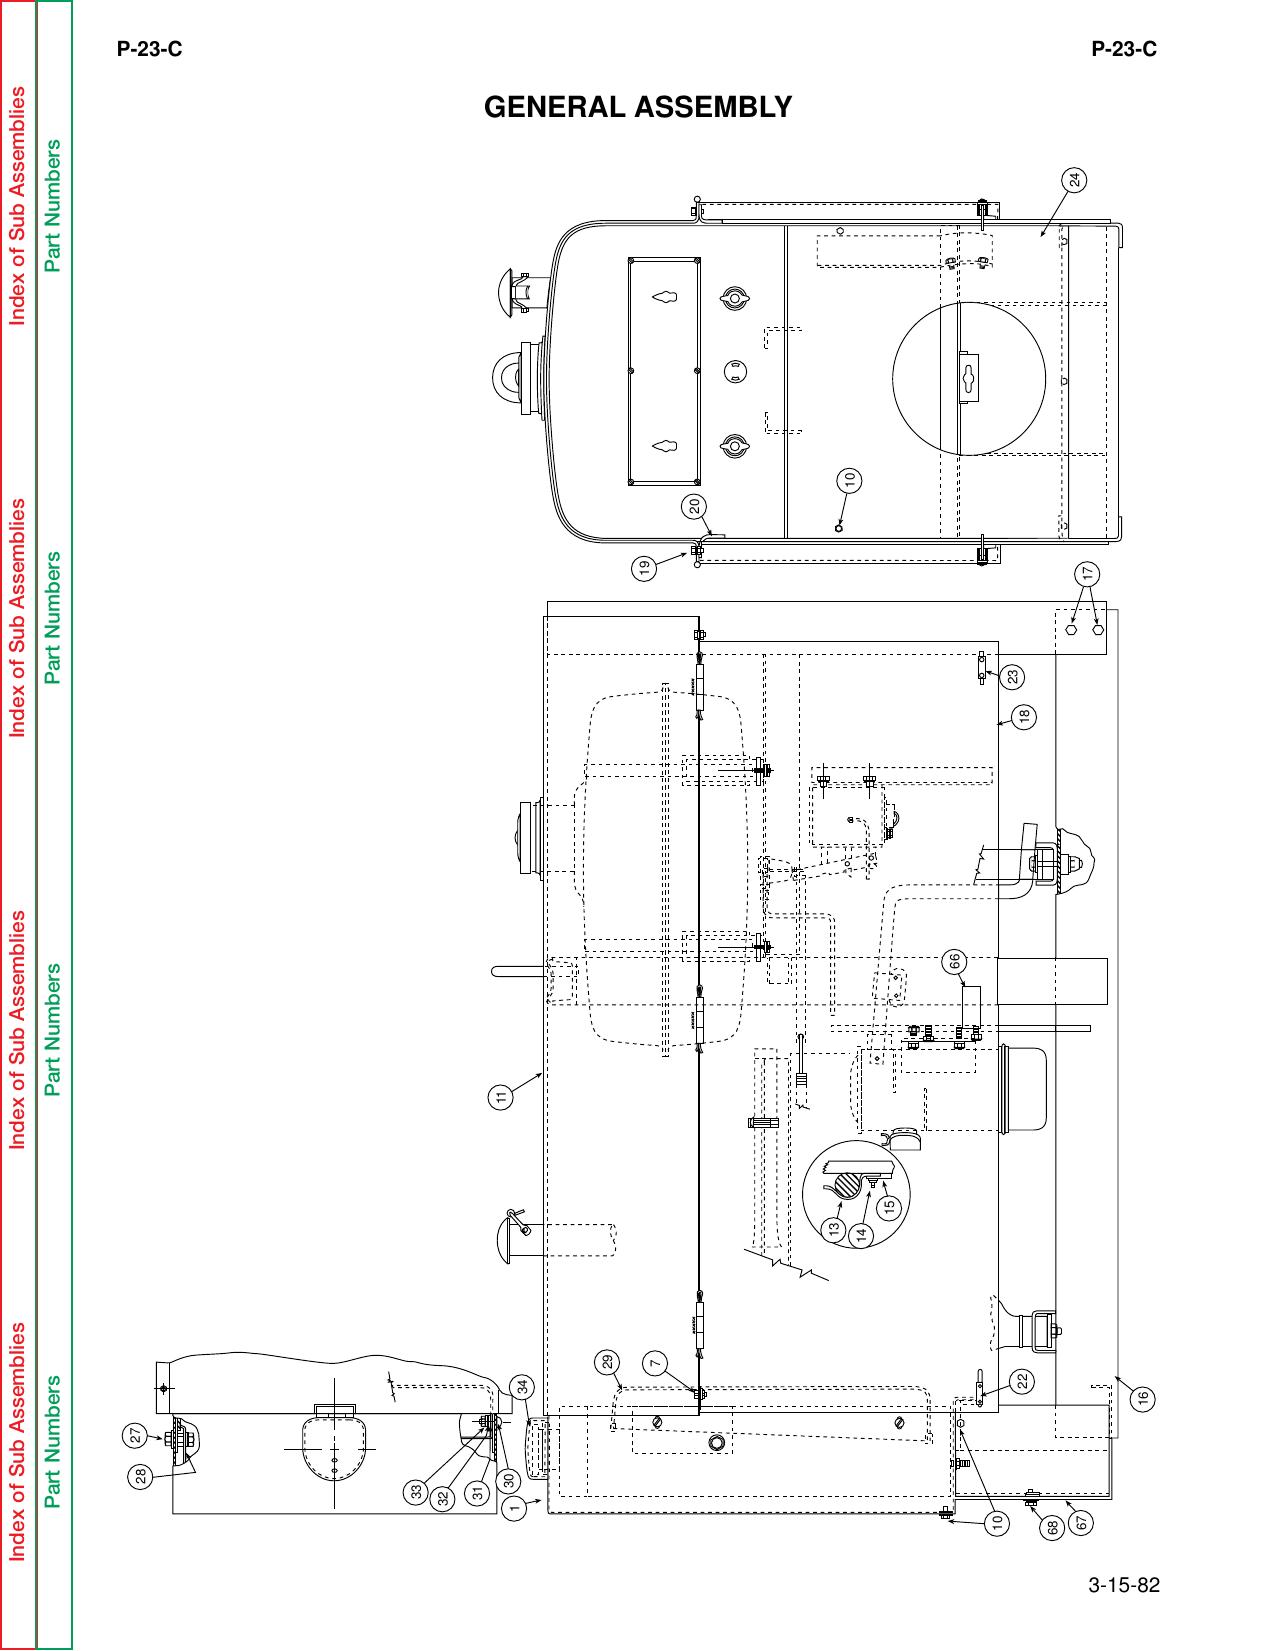 Sa 200 F163 Lincoln Continental Wiring Diagram    Wiring Diagram